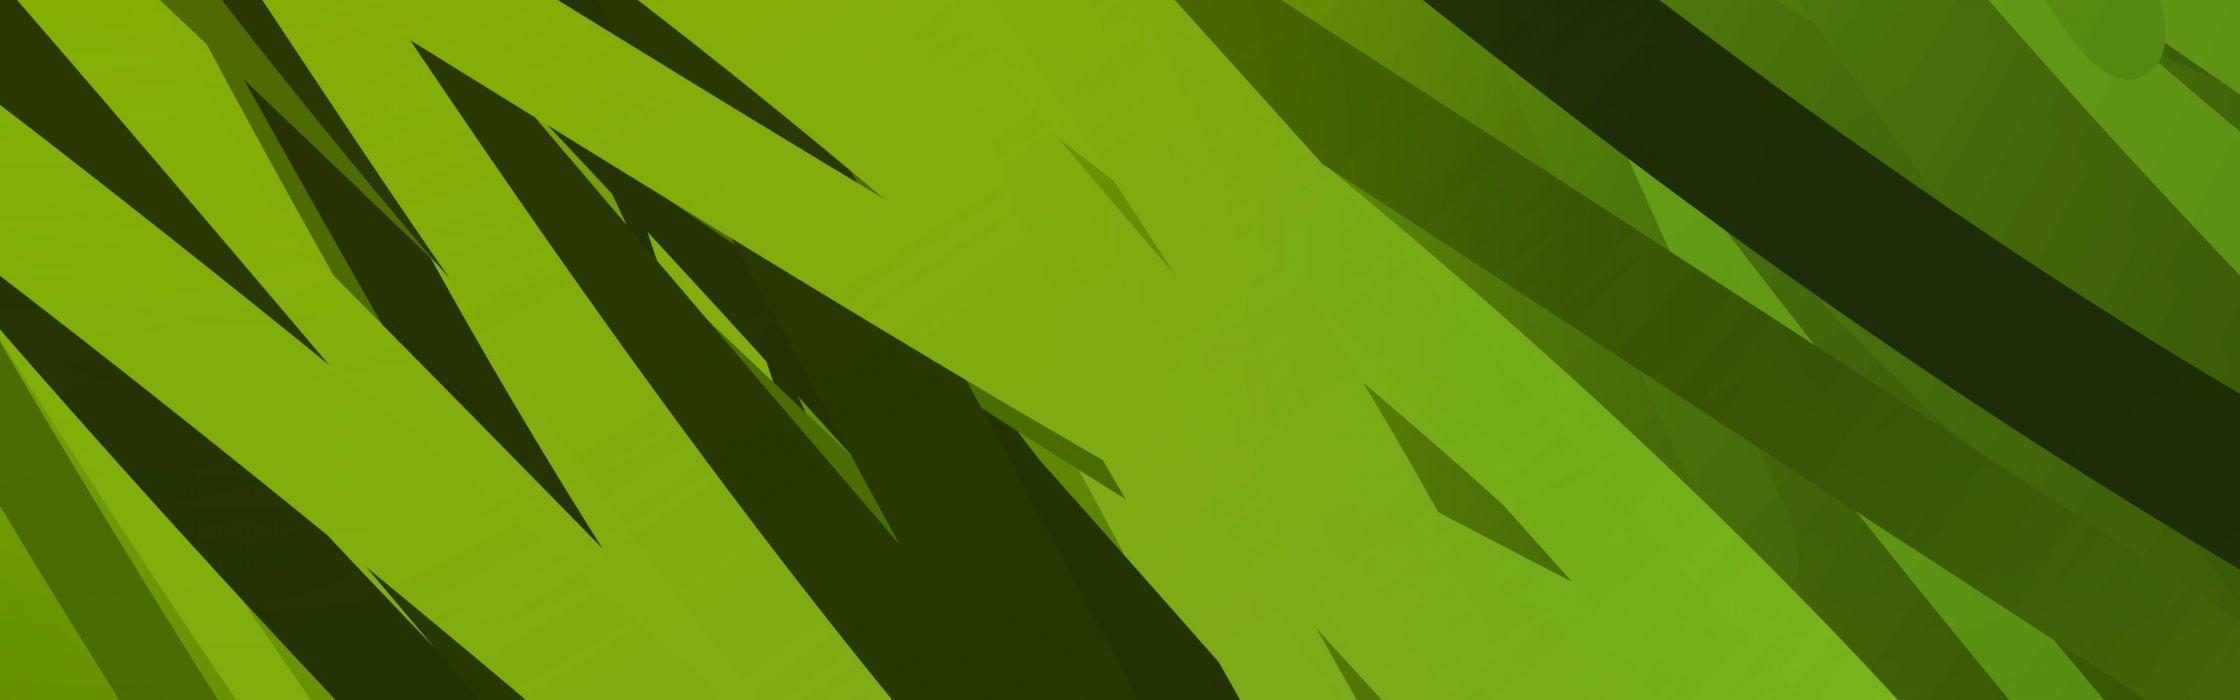 green abstract multiscreen wallpaper